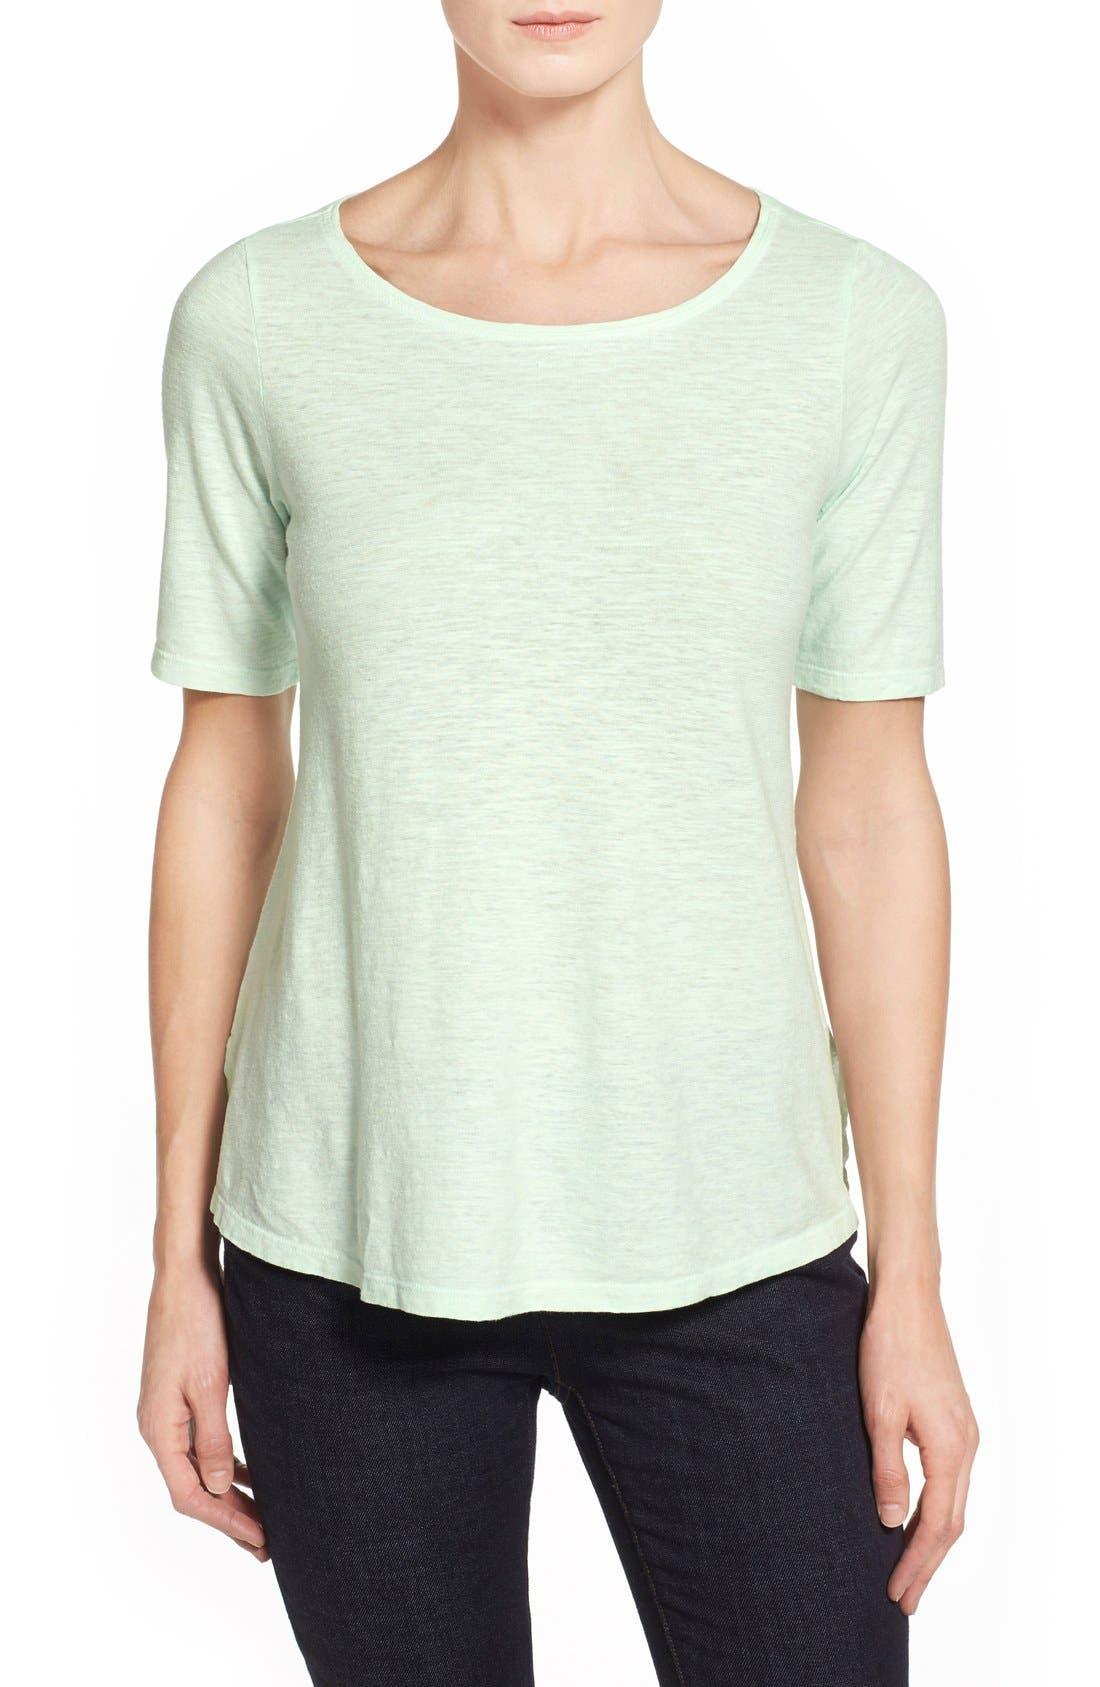 Main Image - Eileen Fisher Hemp & Organic Cotton Top (Regular & Petite)